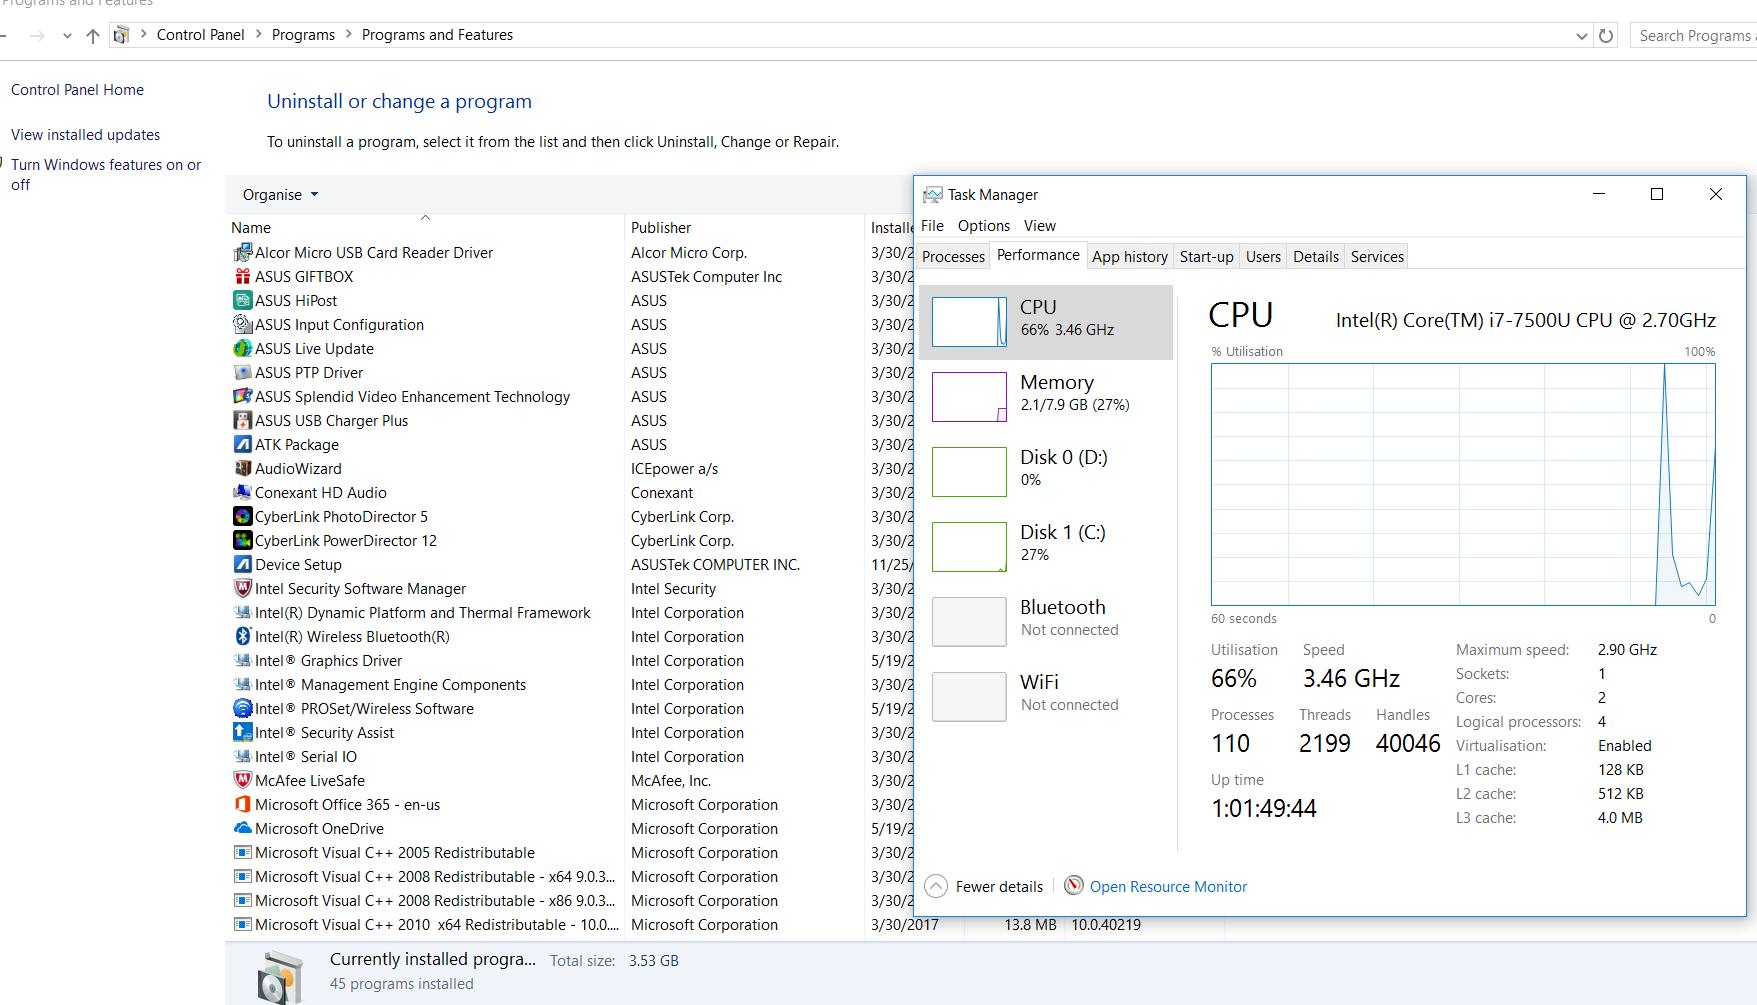 Asus Zenbook UX410UQ (UX3410UQ) review - multimedia notebook